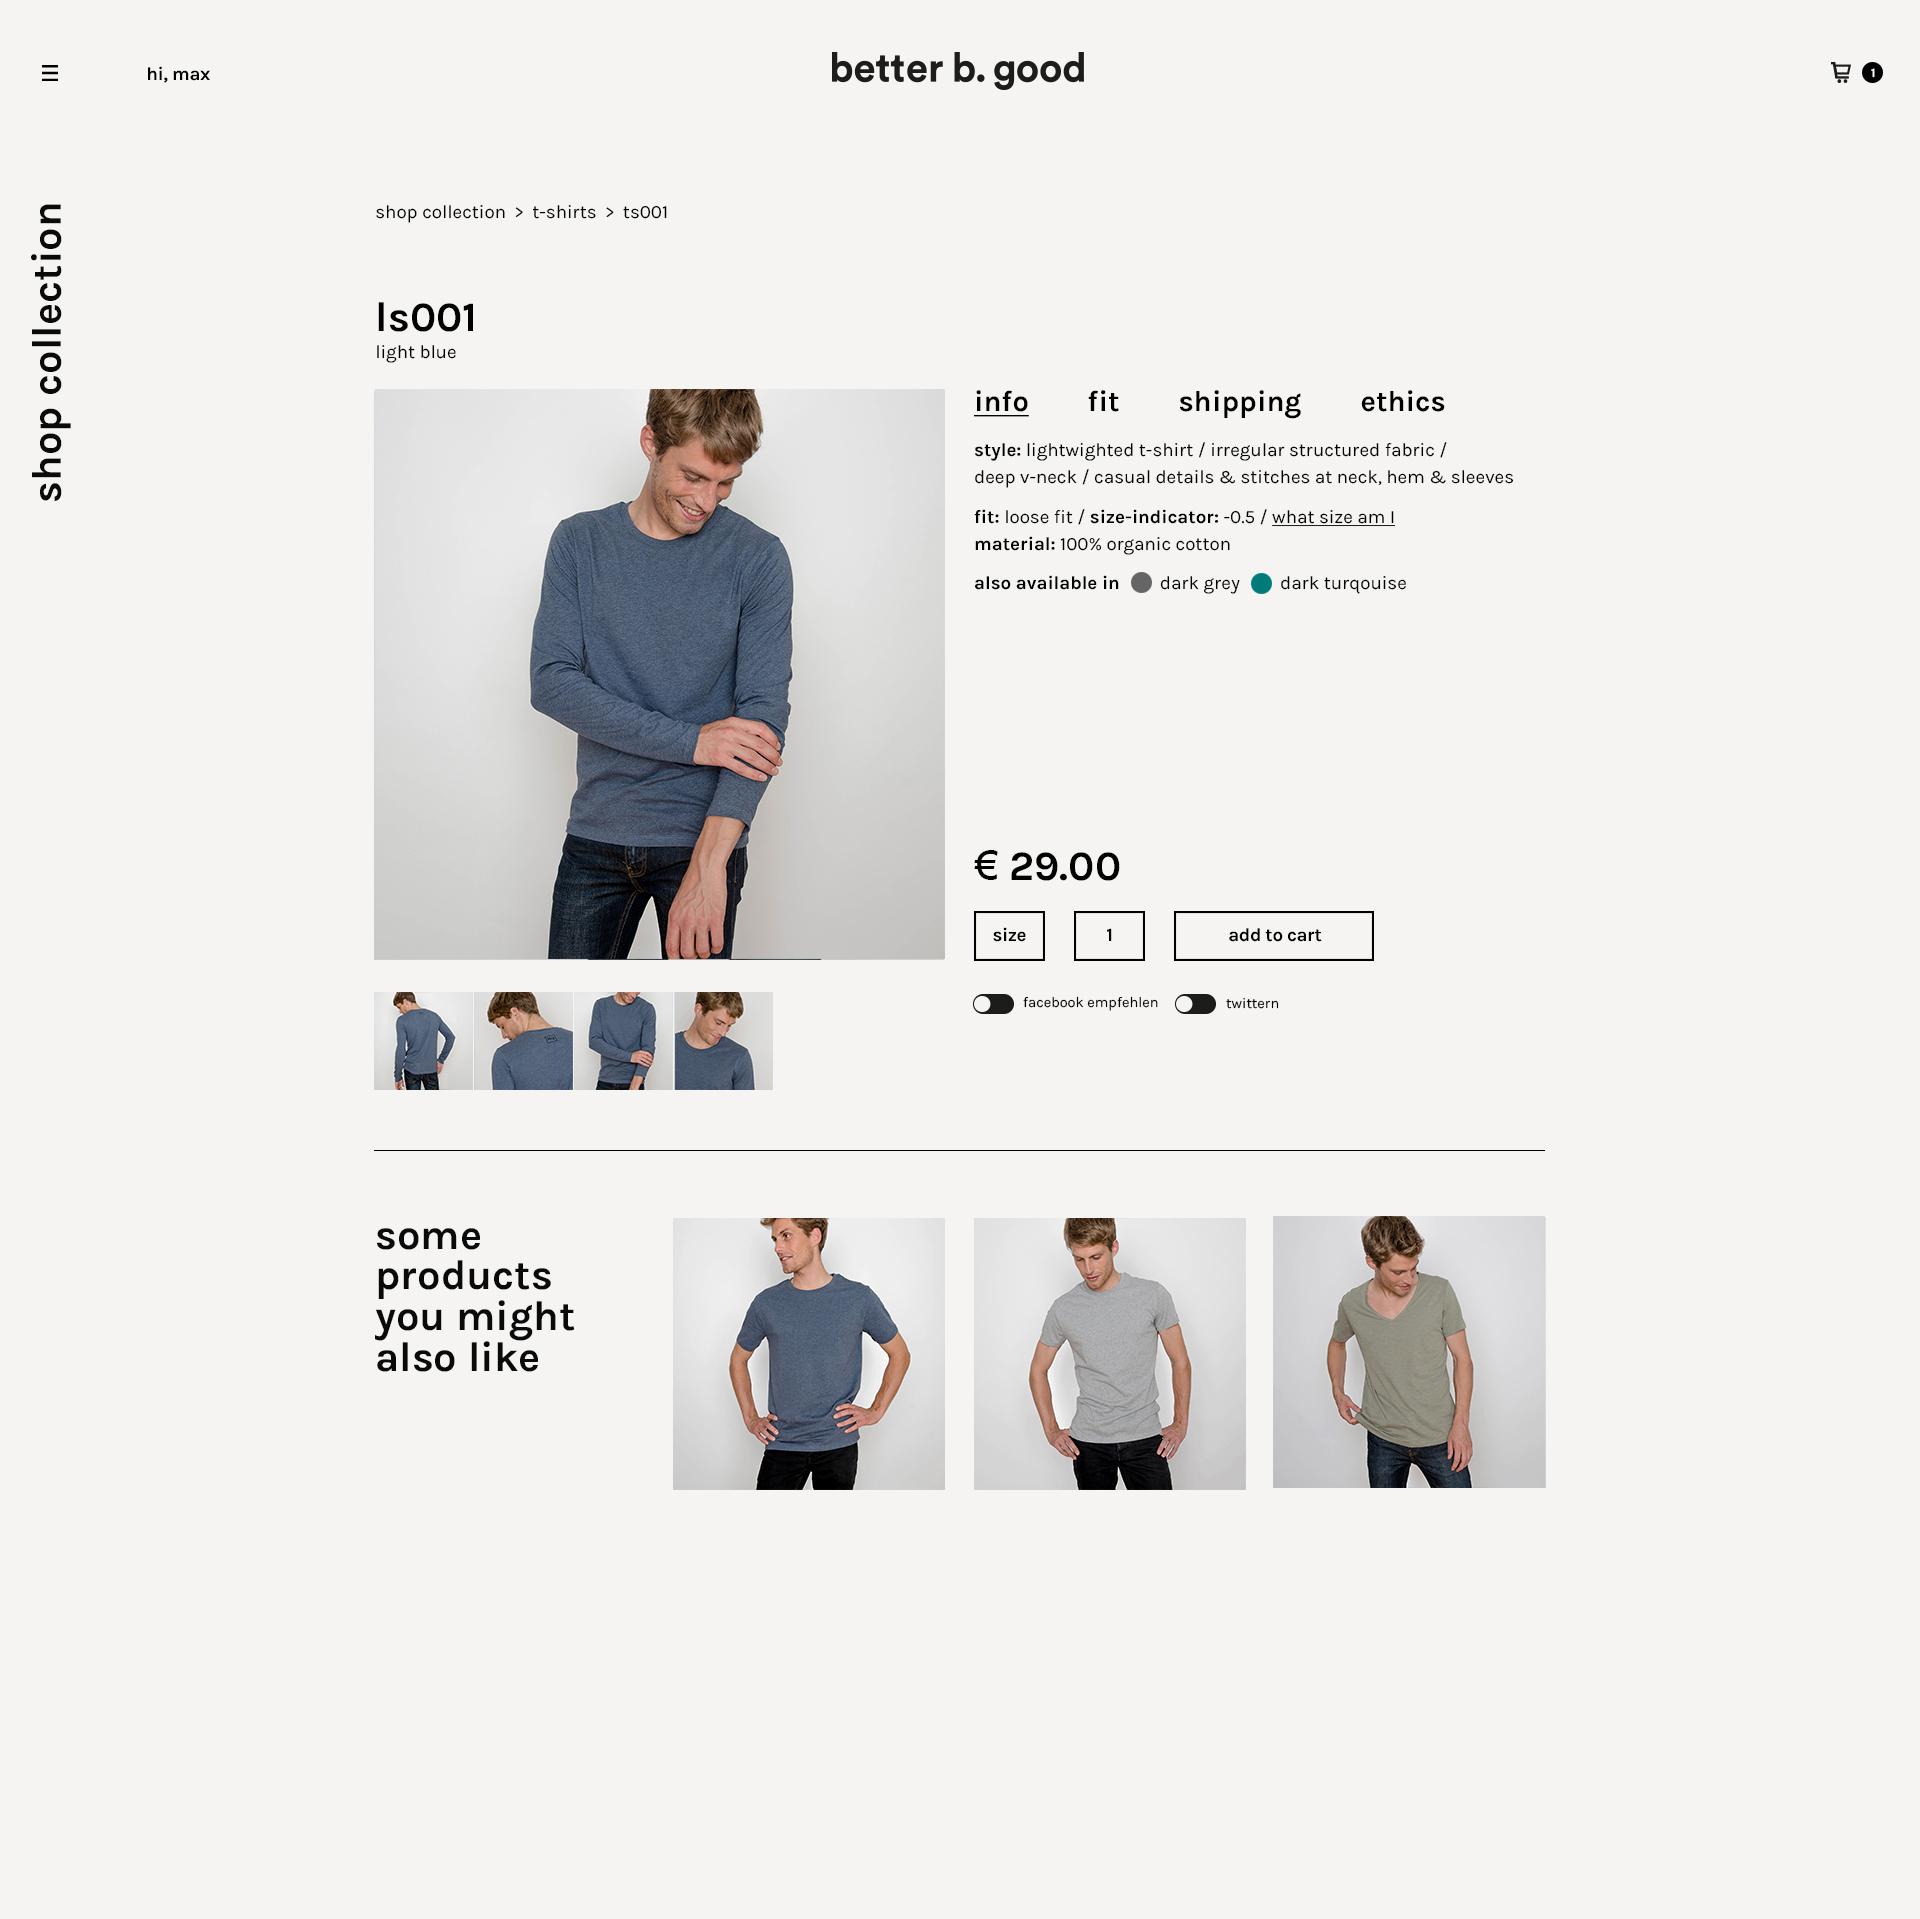 bbg_shop_uea_201803_Produktdetail_WEB_sandra_reichl.jpg